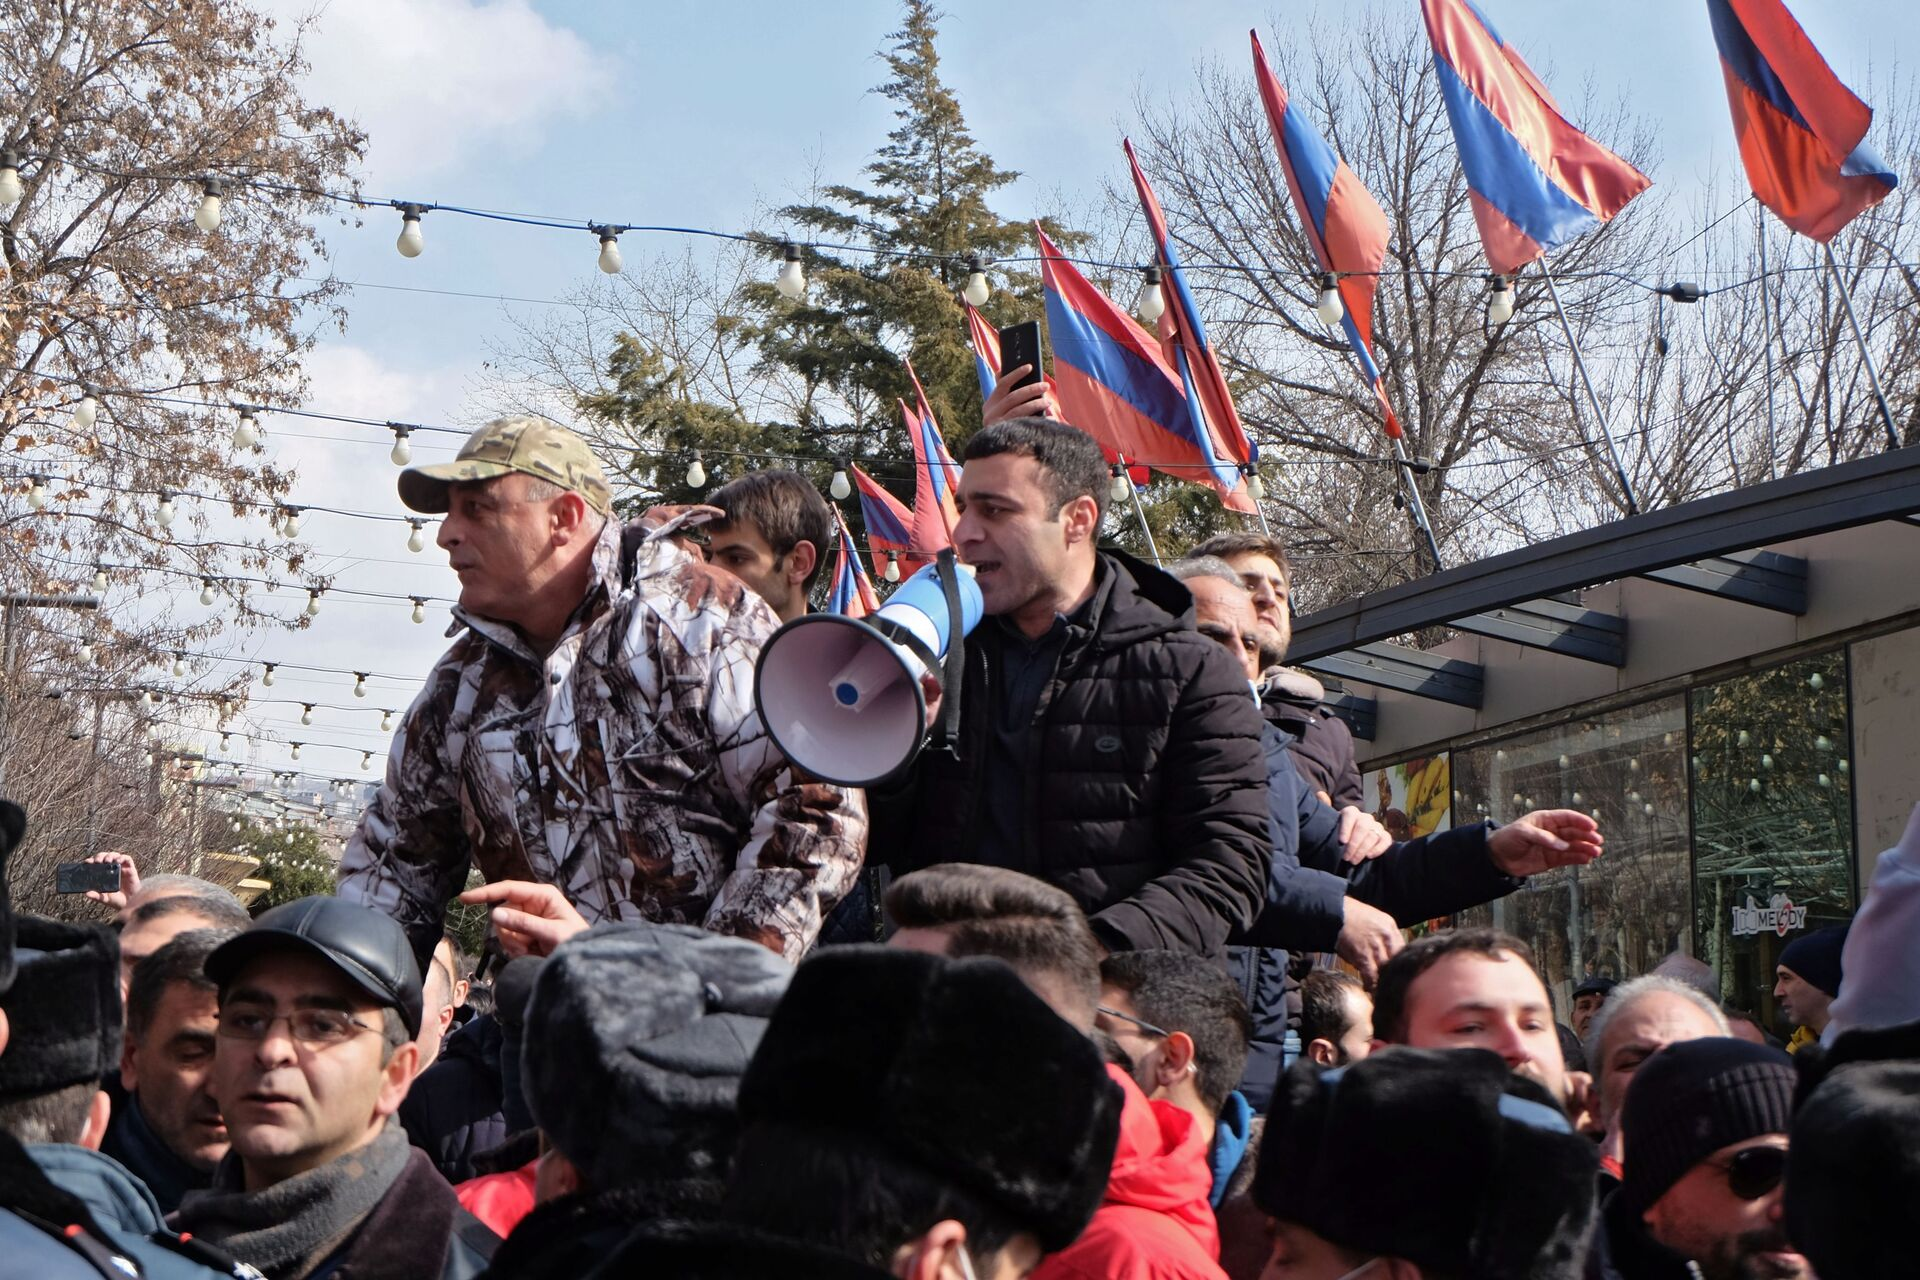 Telefonata tra Putin e premier Pashinyan: discussa crisi politica in Armenia - Sputnik Italia, 1920, 25.02.2021